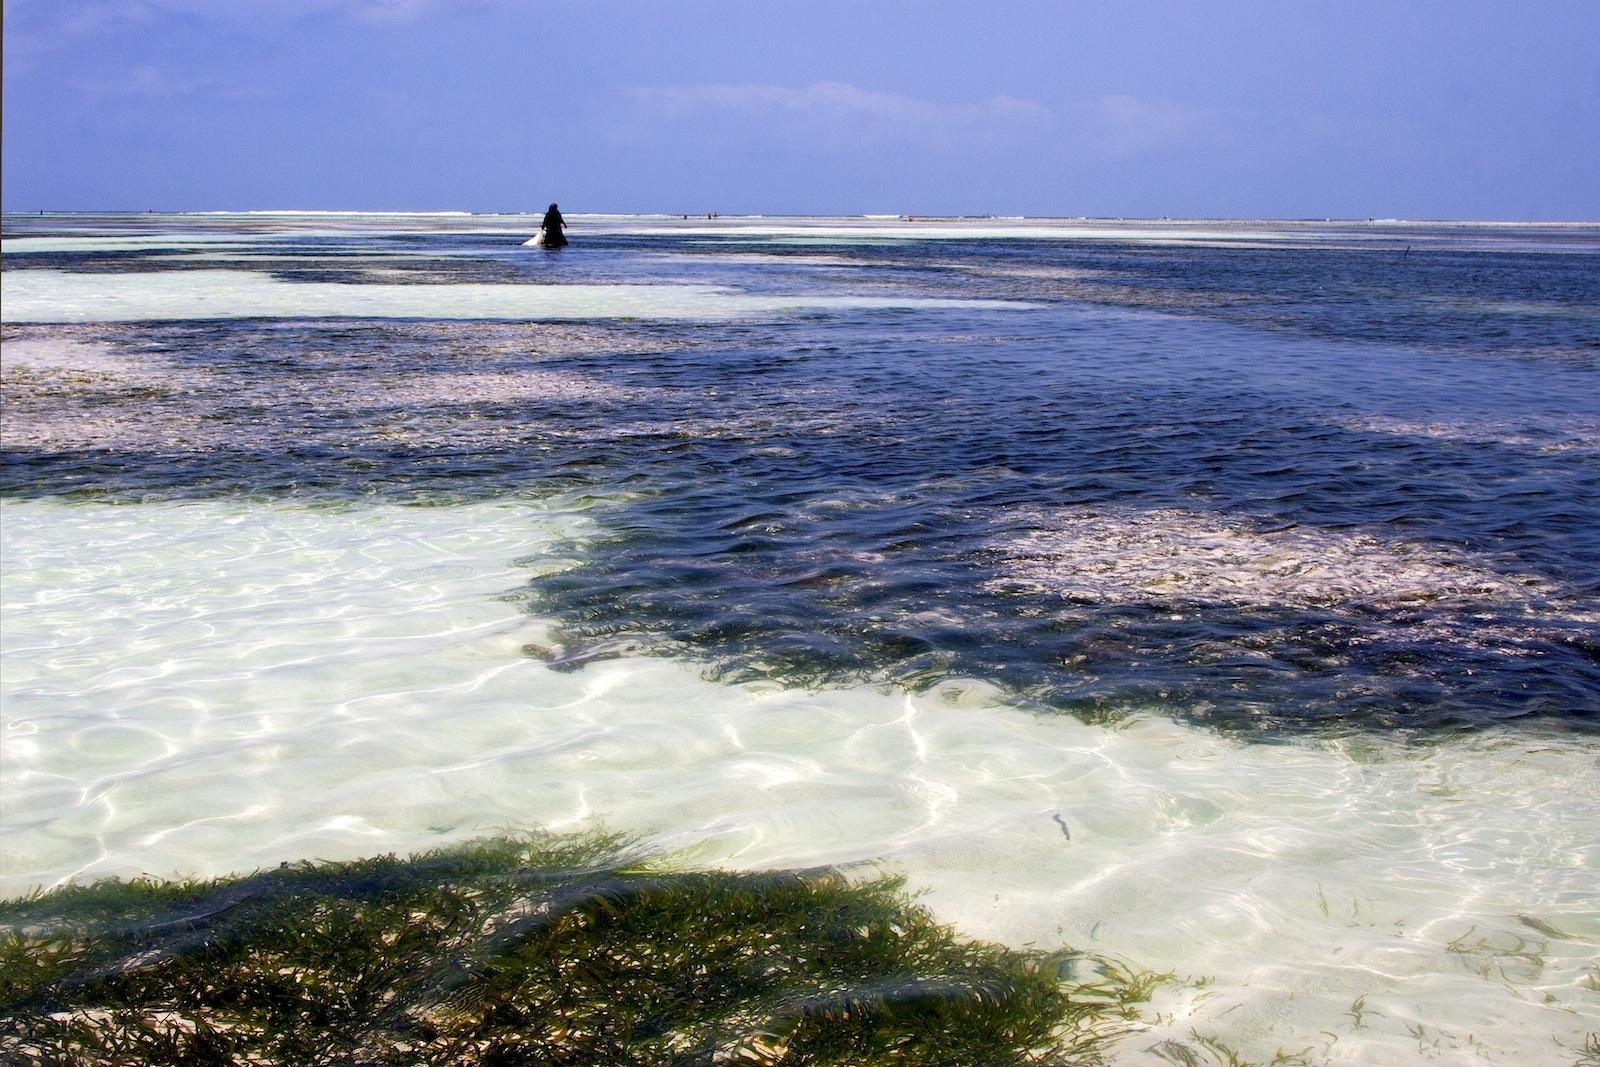 Granjeras de algas en el Índico (Zanzíbar [Tanzania]) Zanzibar4